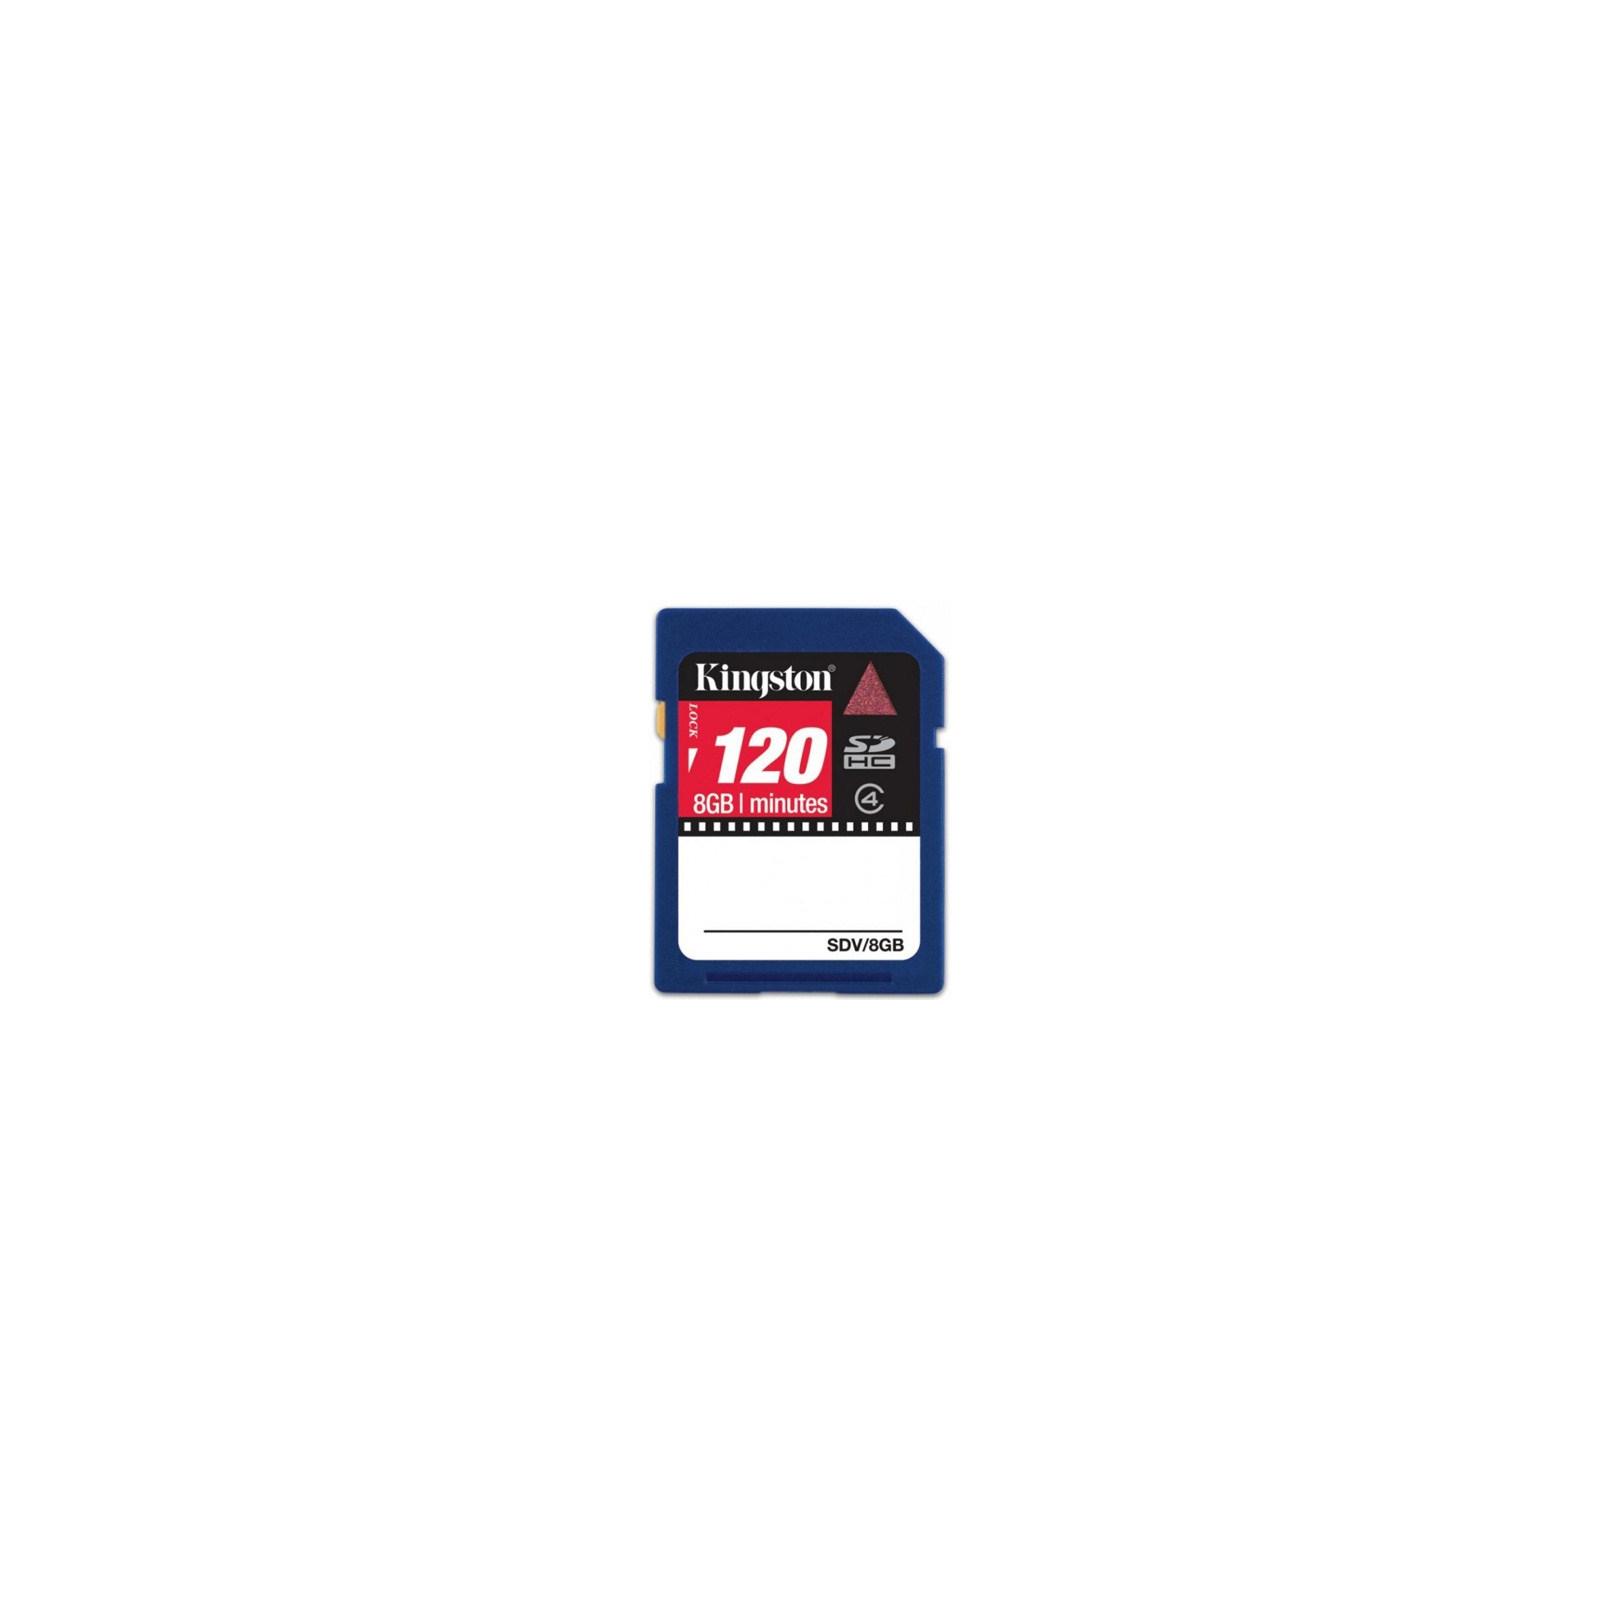 Карта памяти Kingston 8Gb SDHC class 4 Video (SDV/8GB)